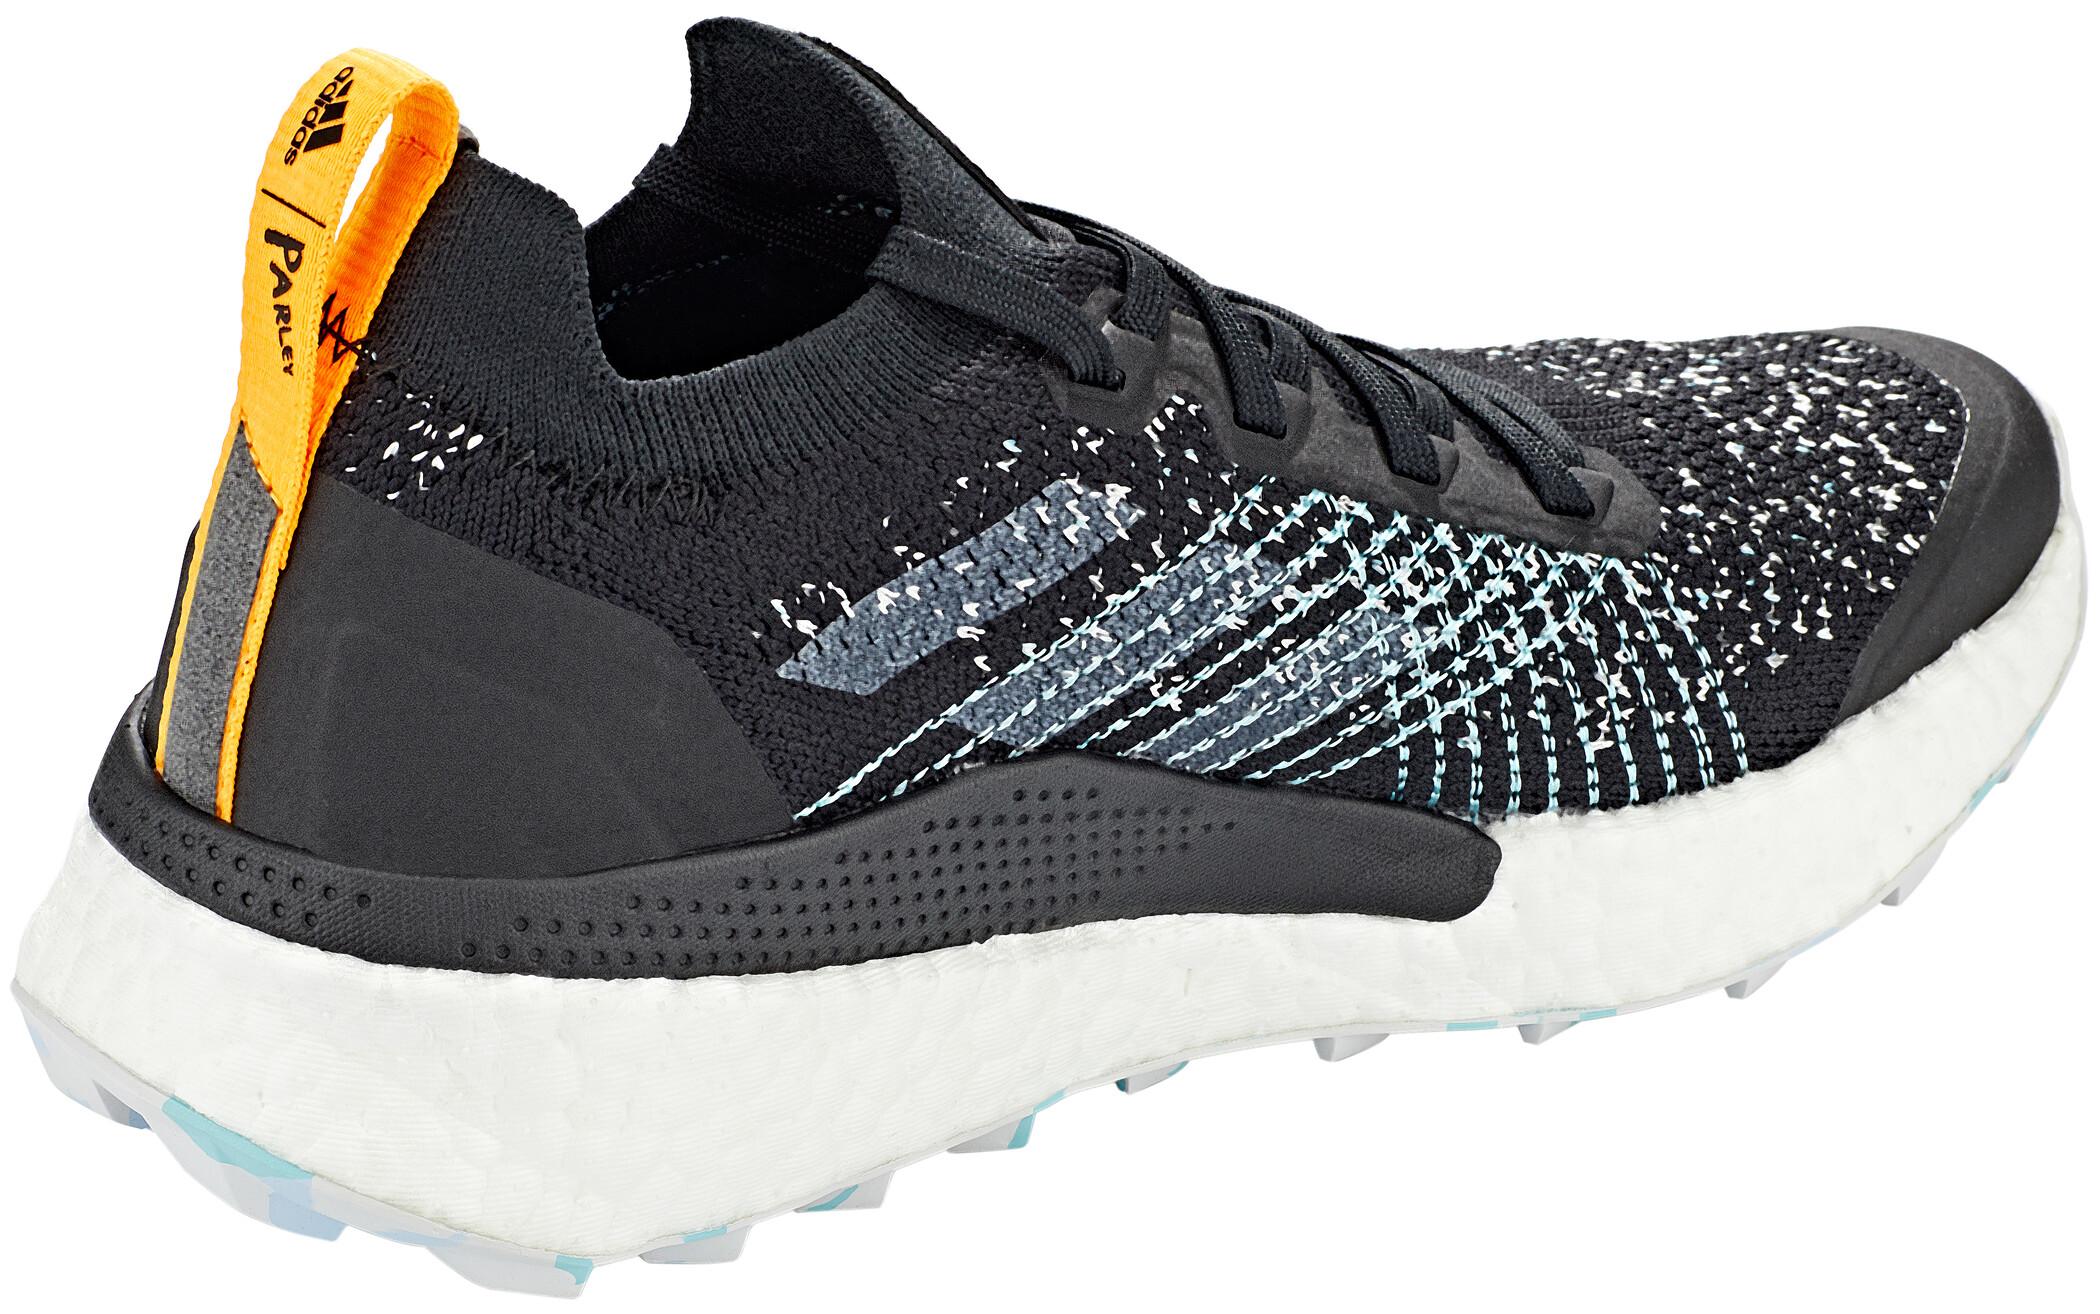 adidas TERREX Two Ultra Parley Trail Running Schuhe Damen core blackdash greyblue spirit